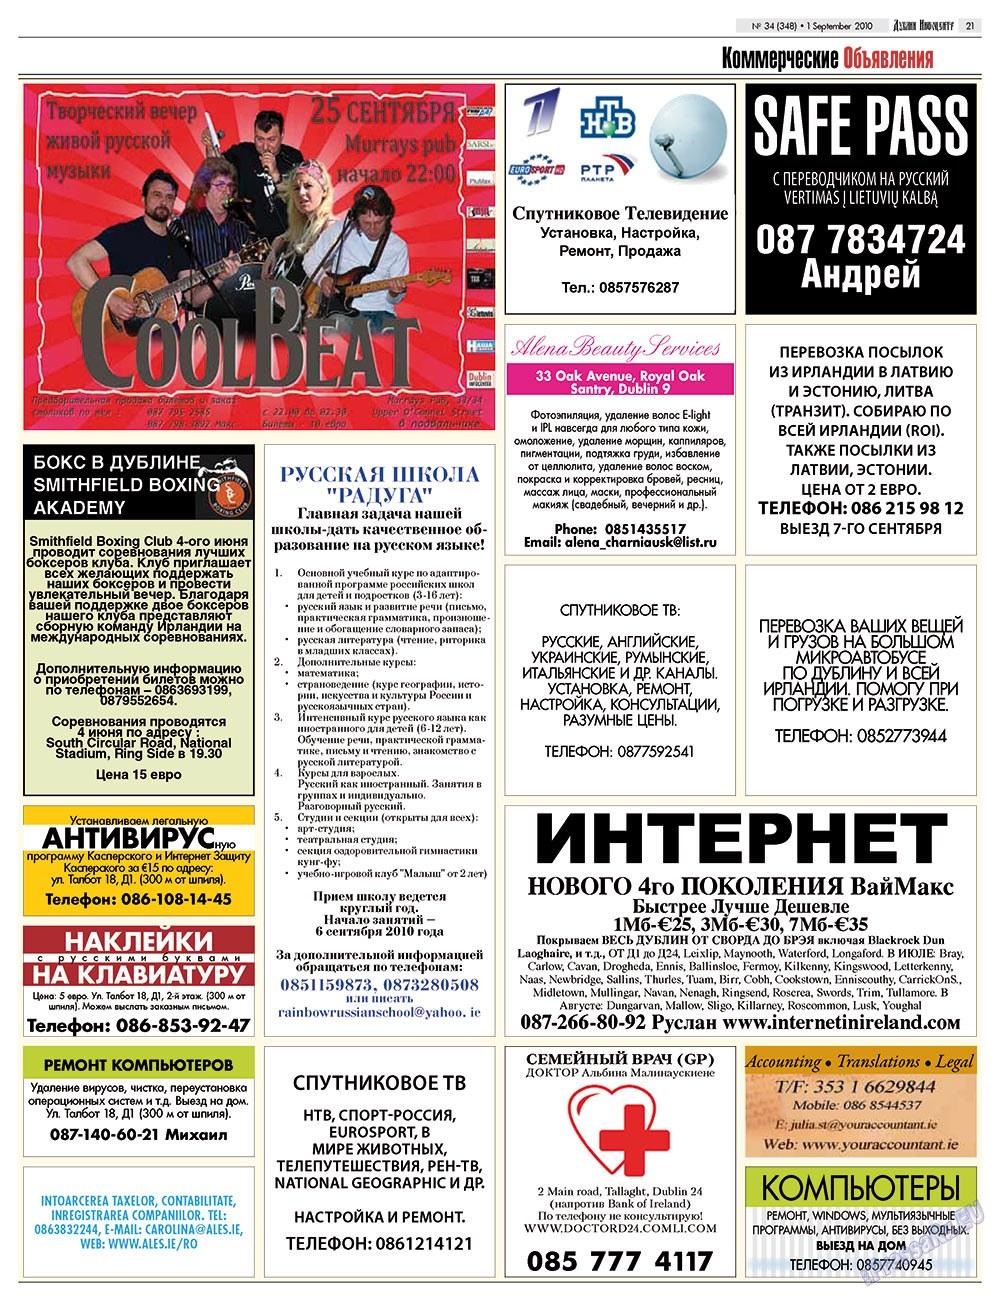 Дублин инфоцентр (газета). 2010 год, номер 34, стр. 21